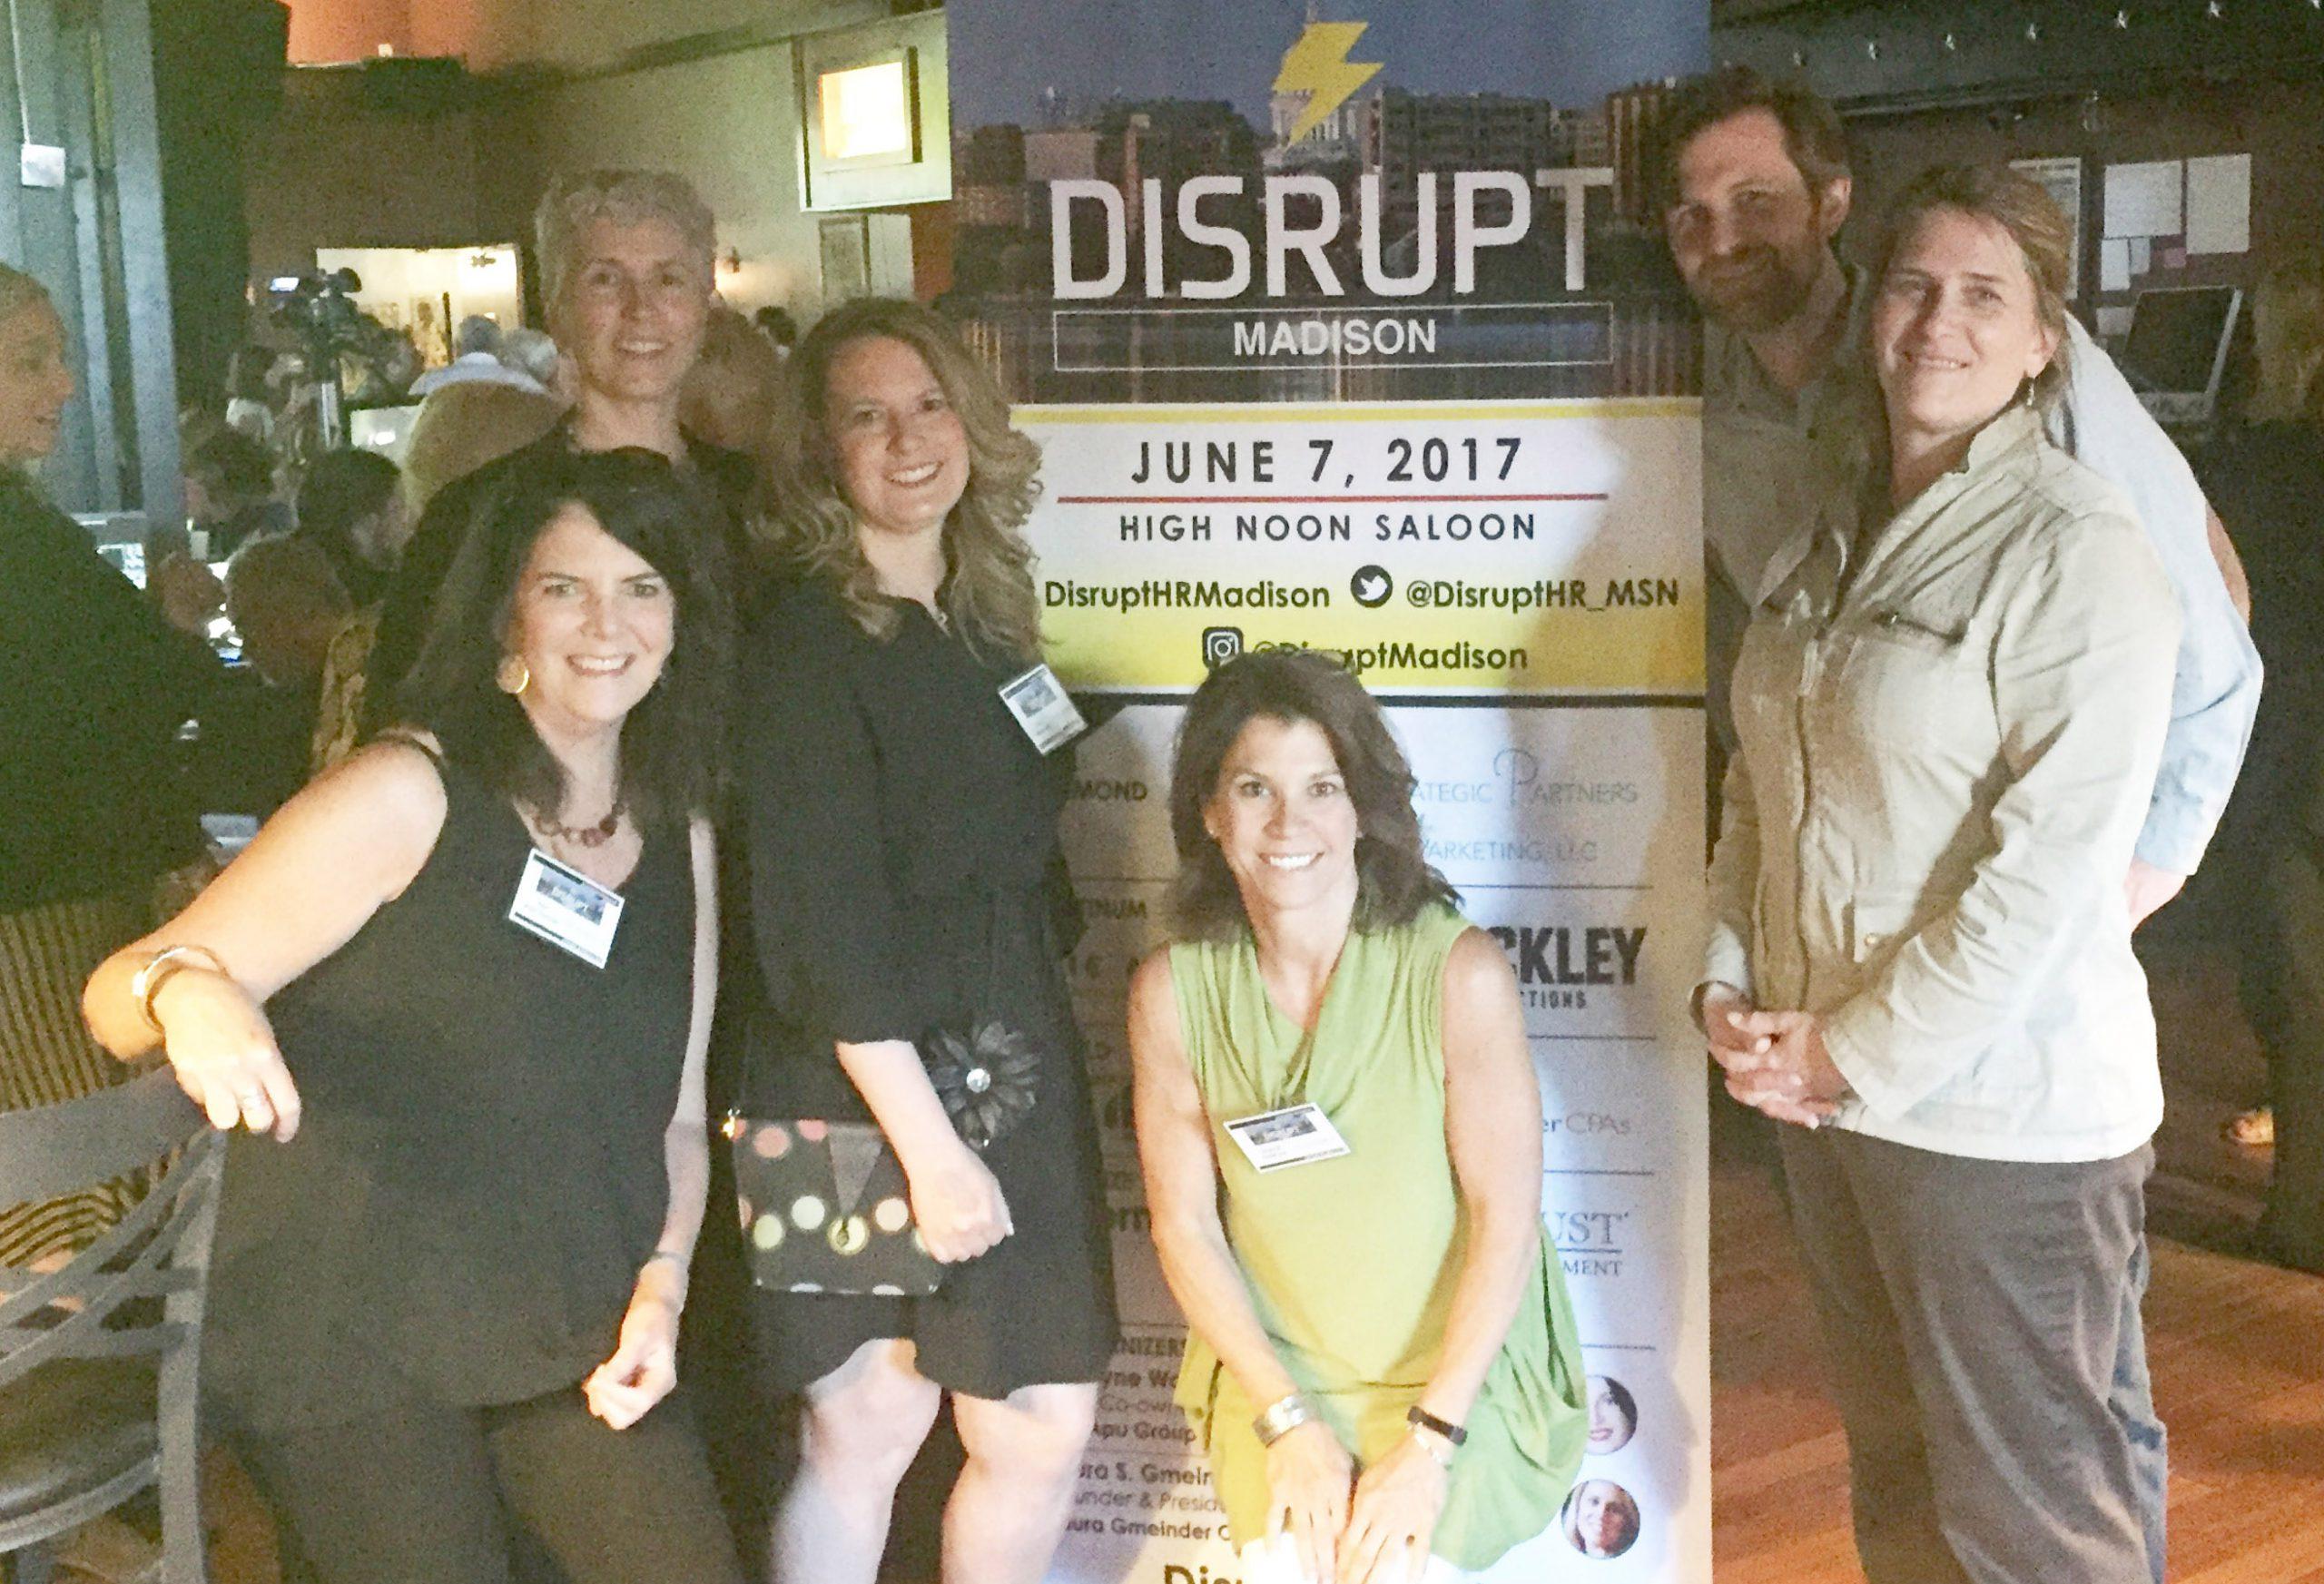 The Alliance Team at DISRUPT Madison